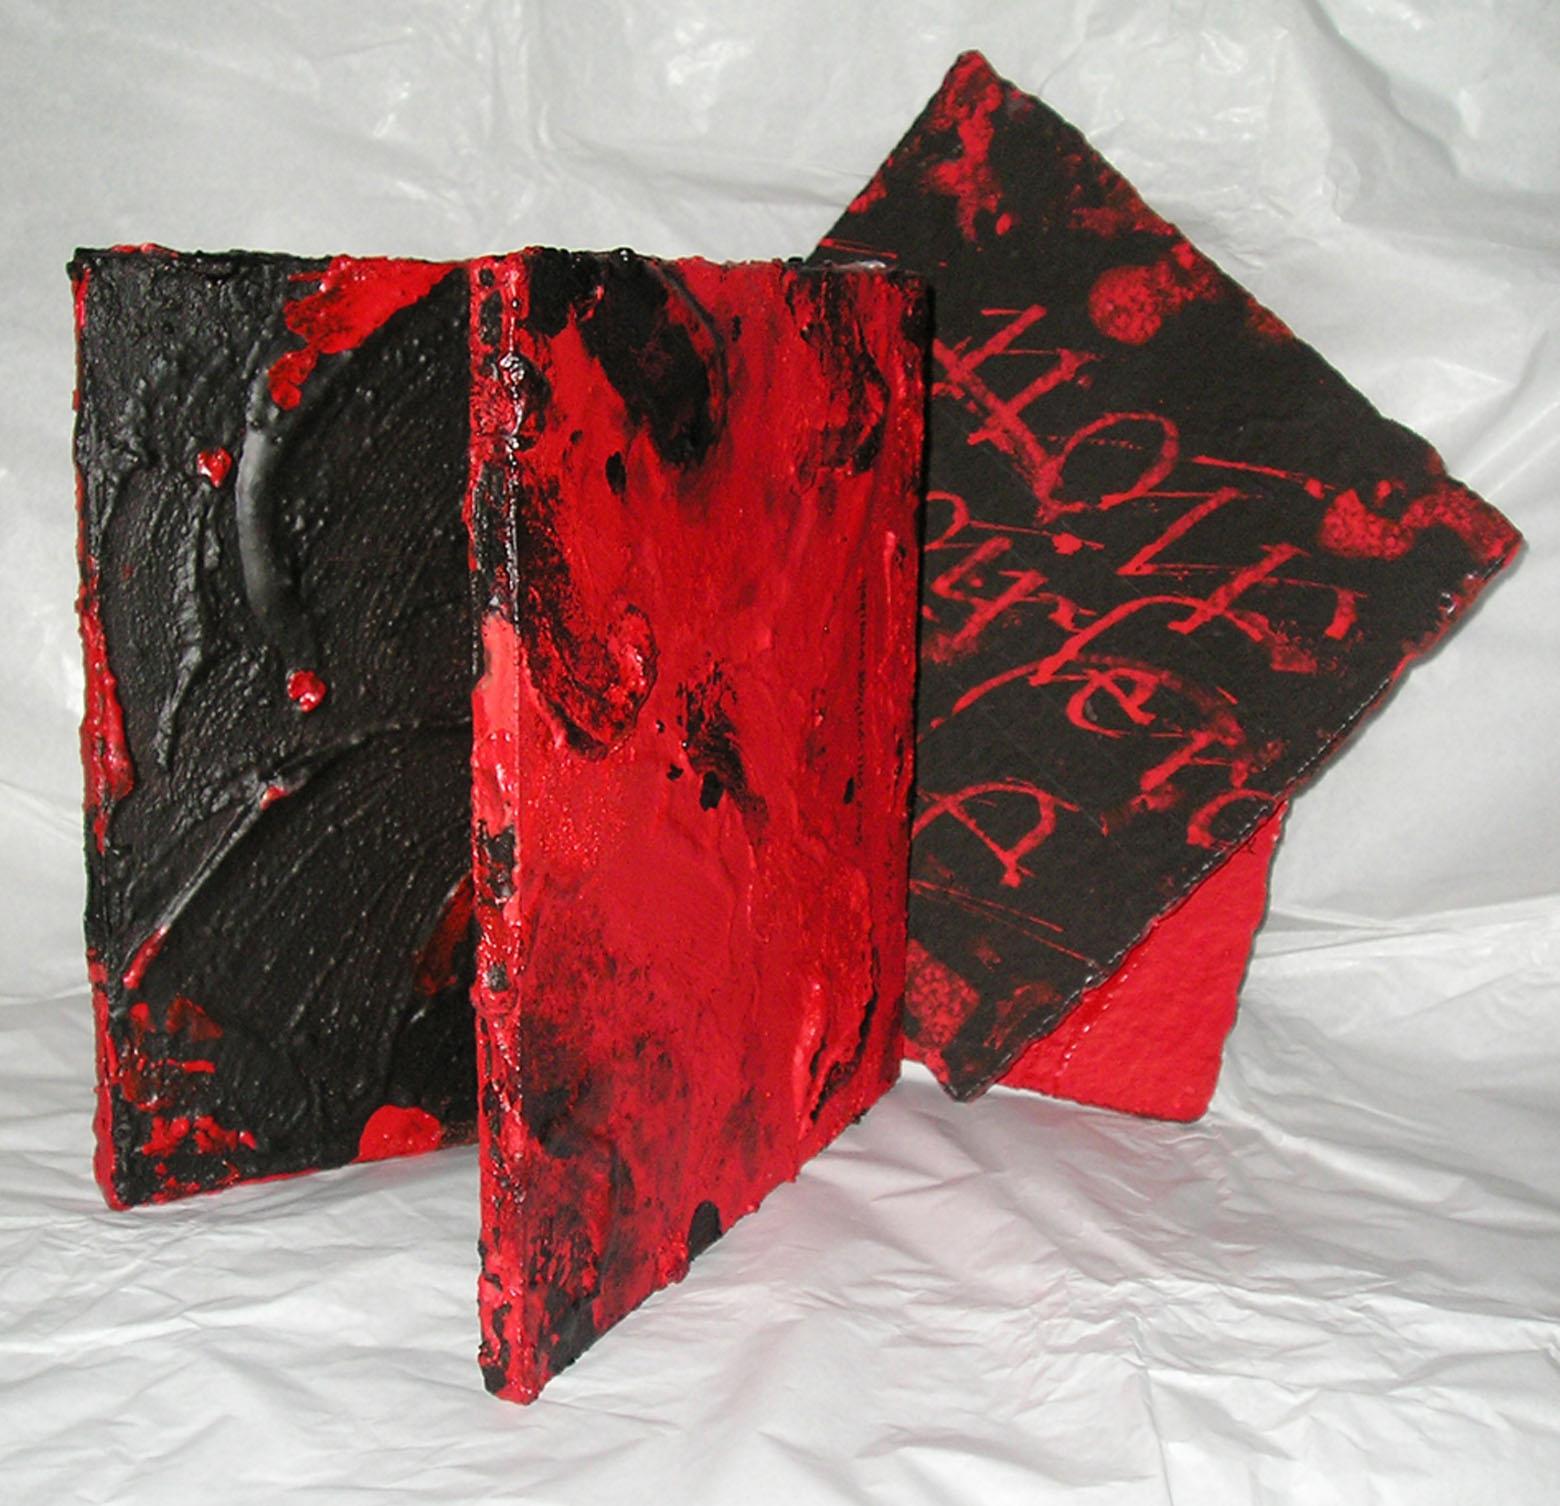 mariella bogliacino Libro Le Rouge et le Noir 03.jpg